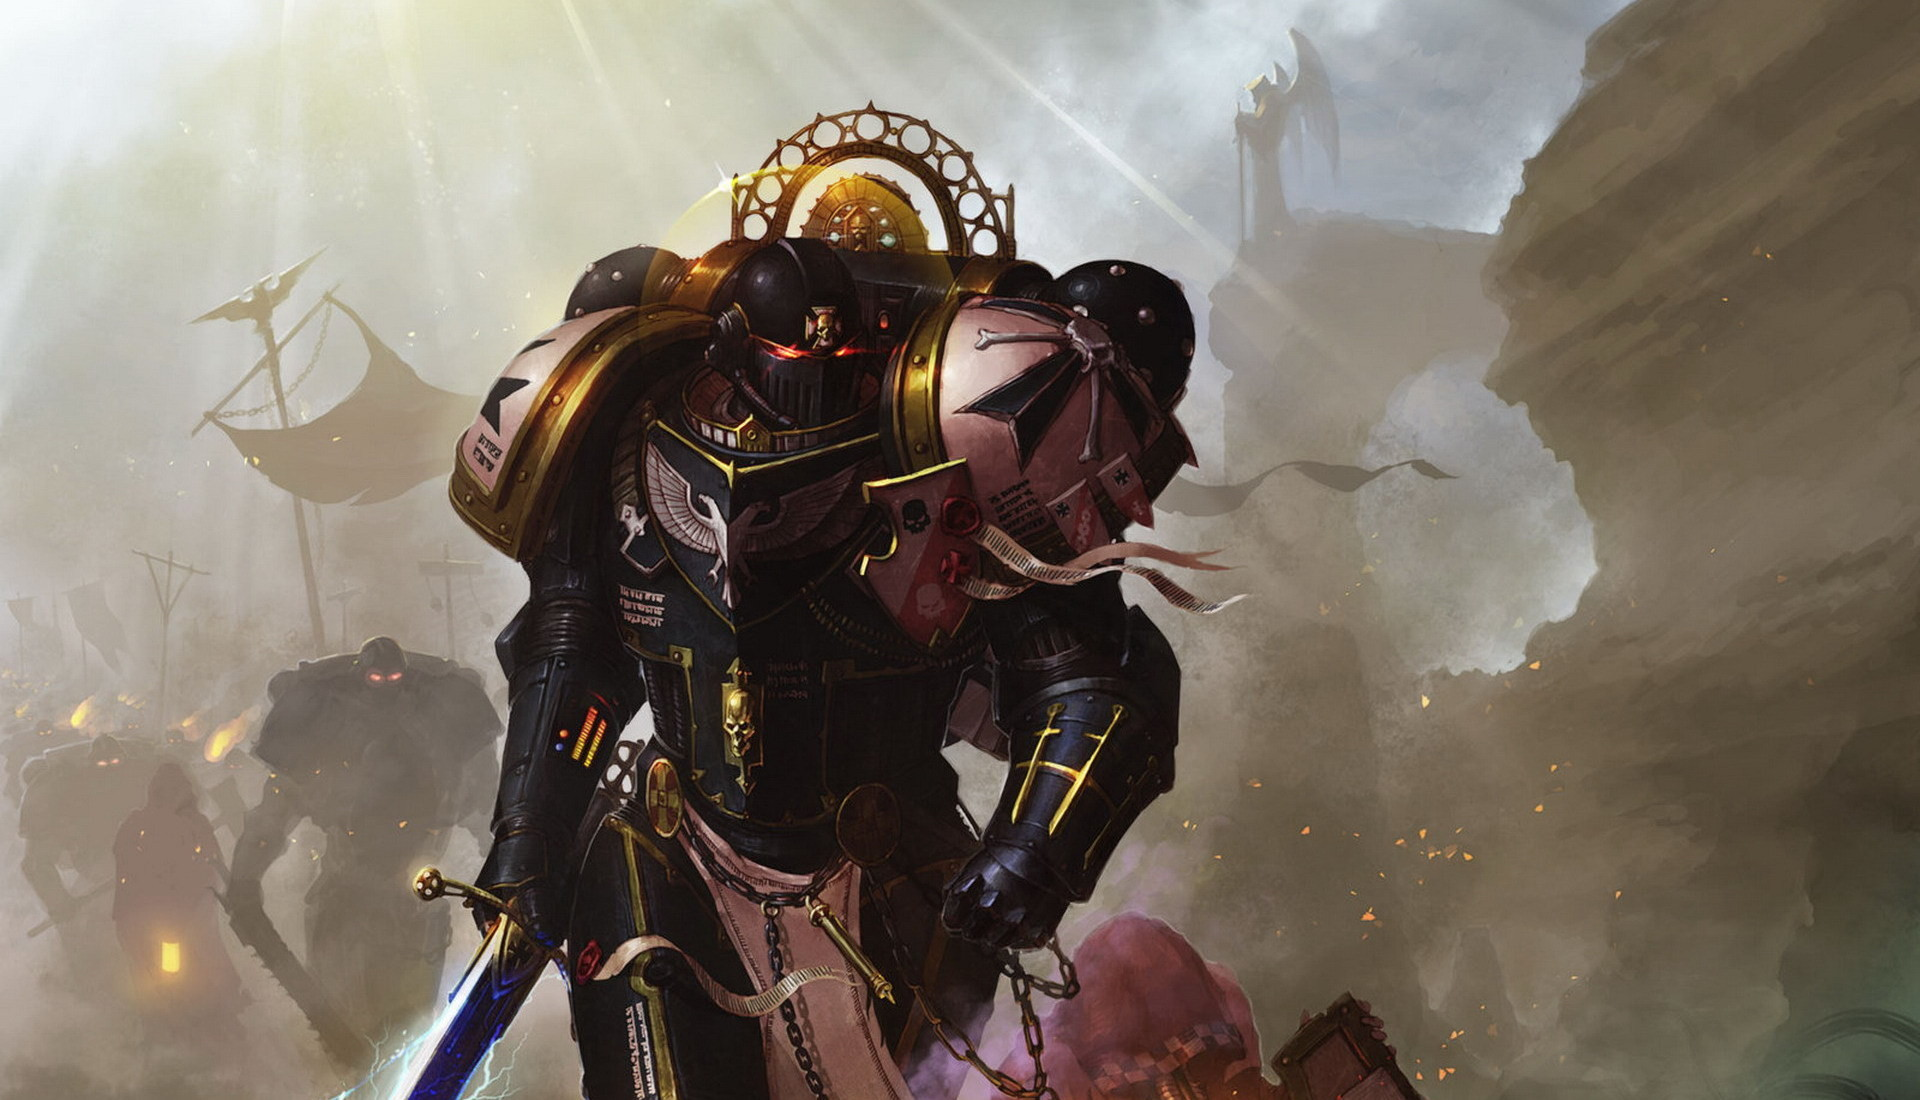 Wallpaper Warhammer, Warhammer 40k, Space marines, Black templars, Imperors  champion